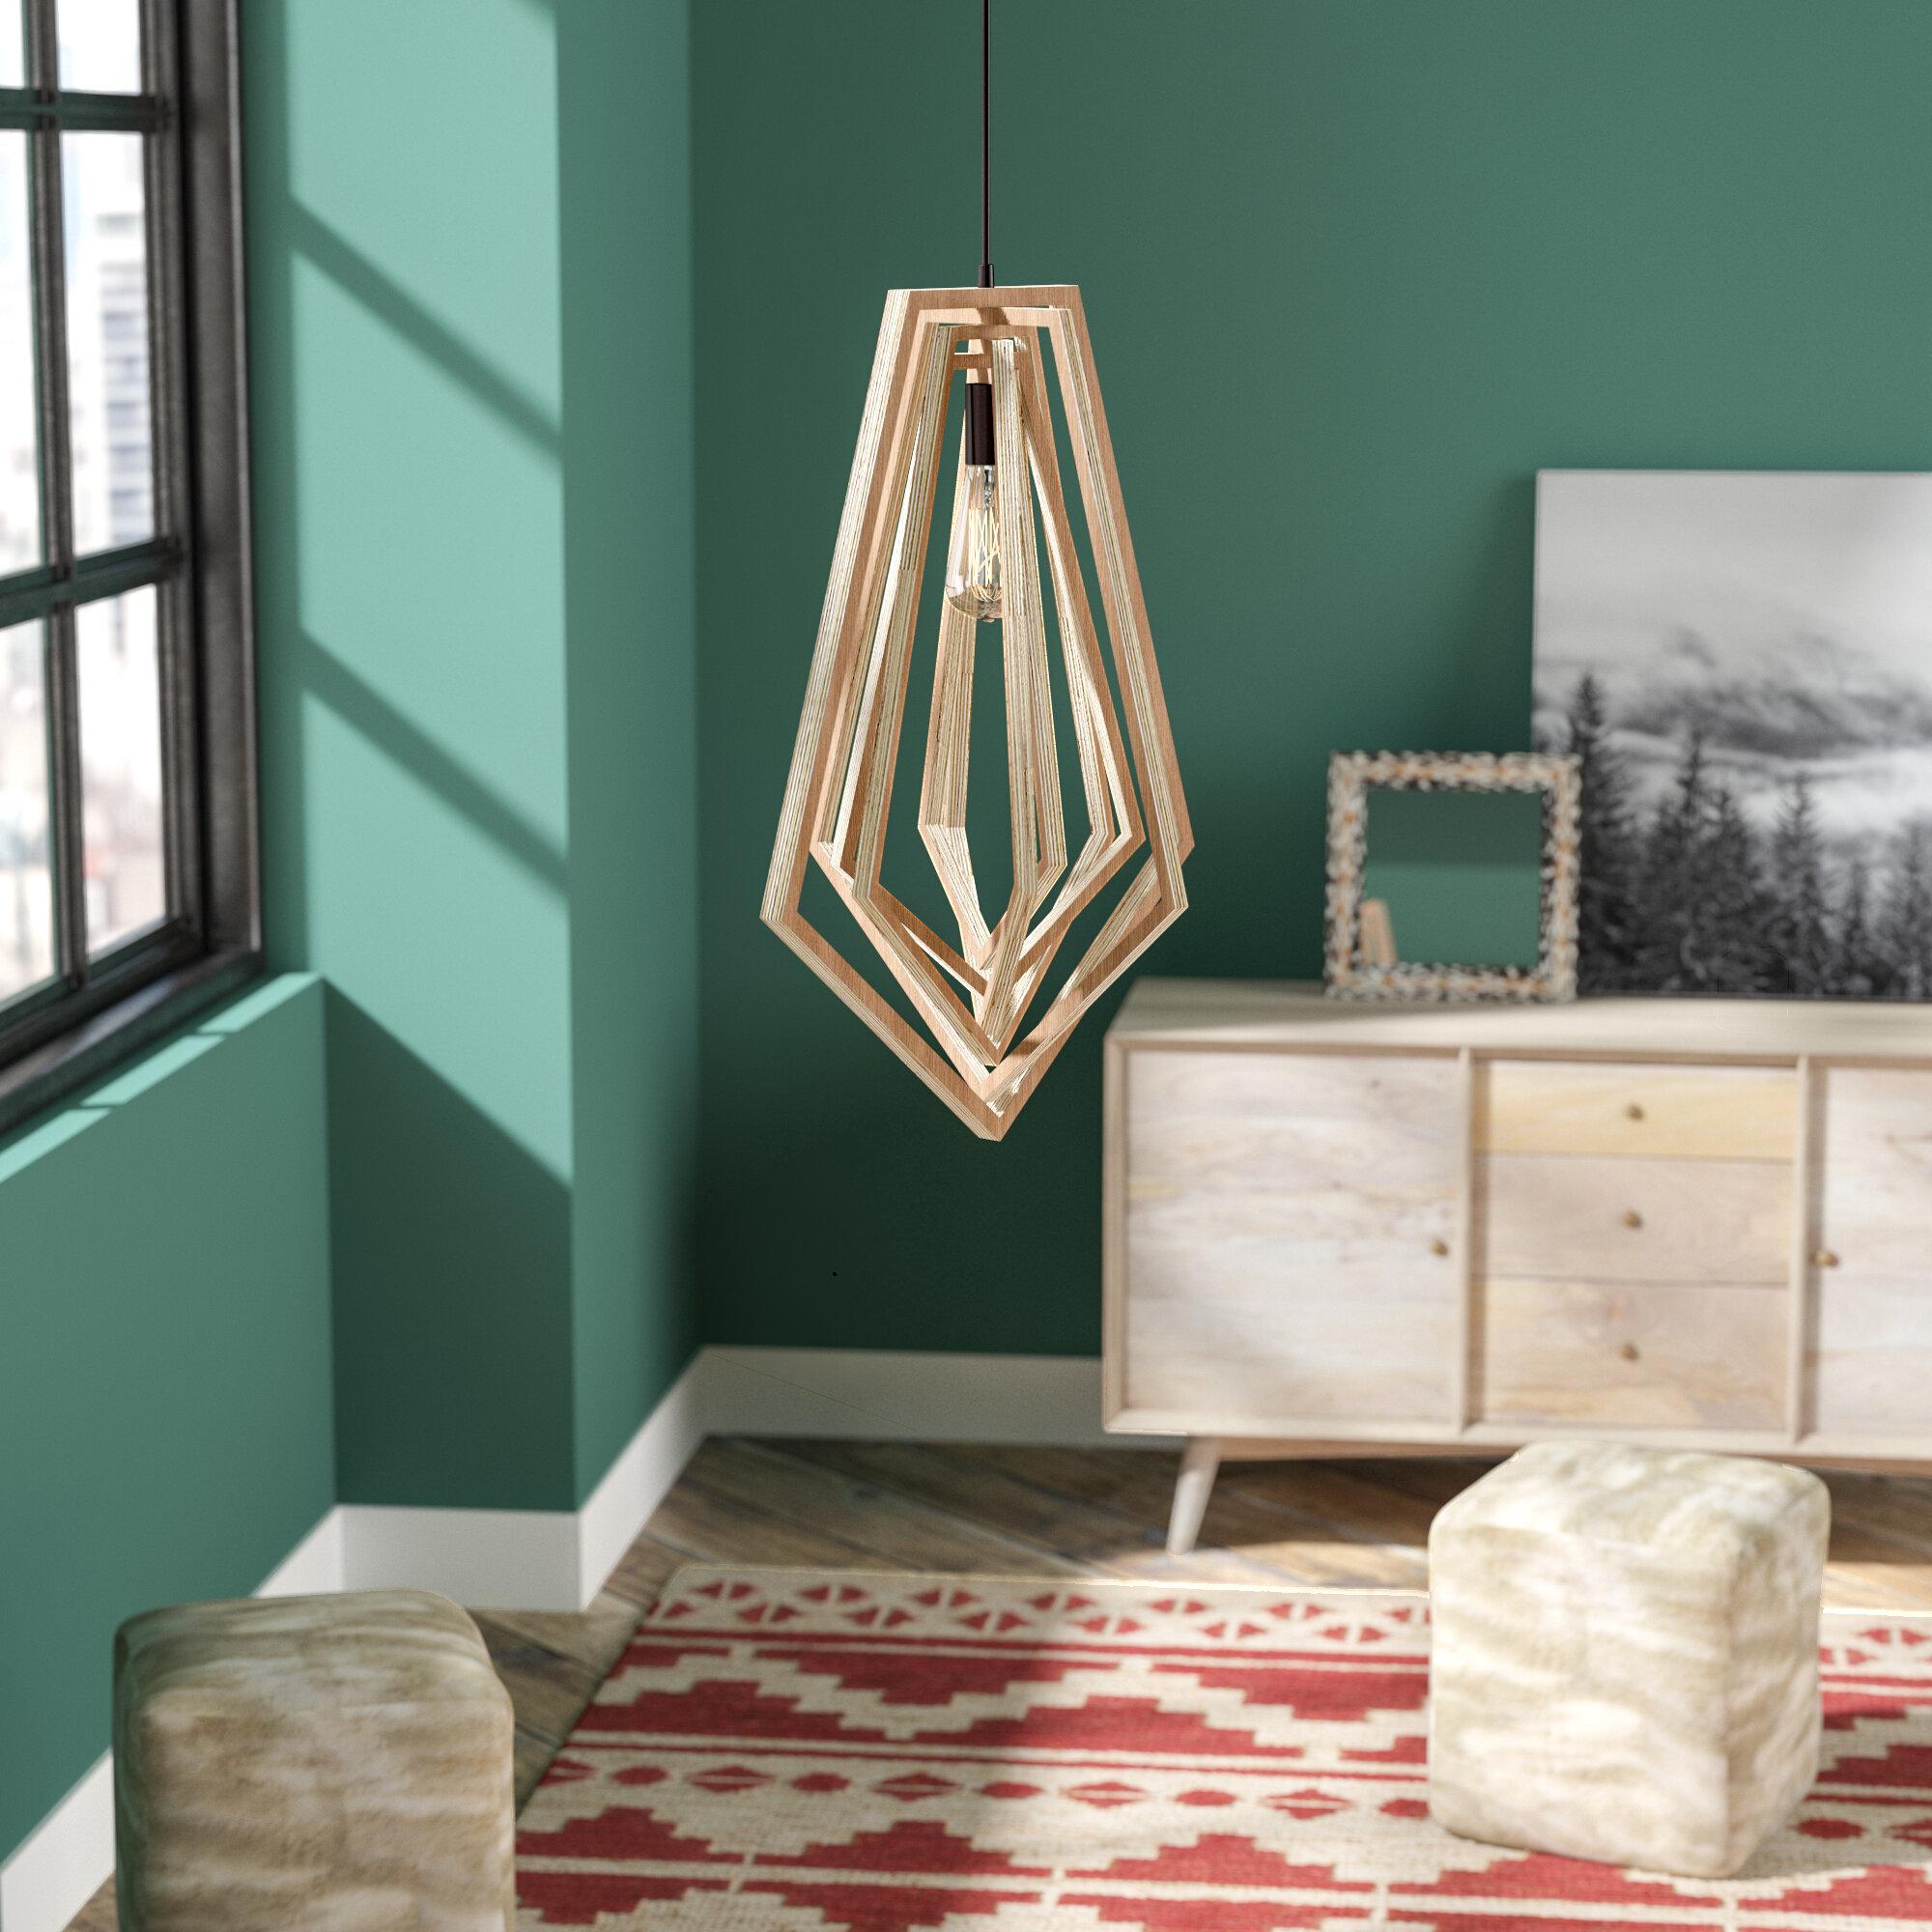 Union Rustic Shelbi 1-Light Pendant & Reviews | Wayfair